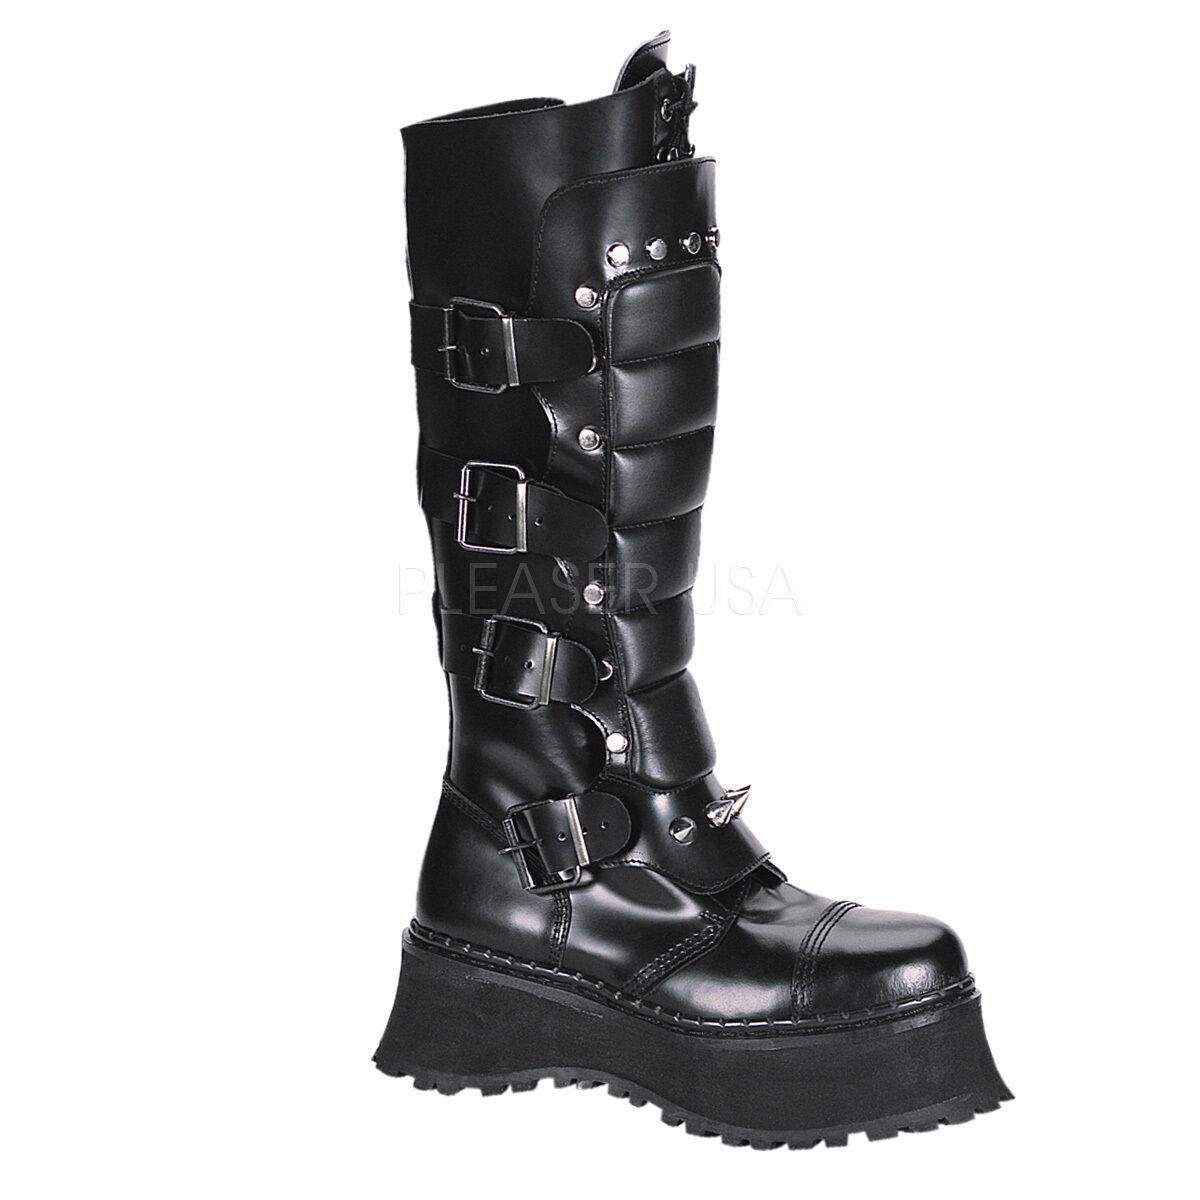 Demonia RAVAGE-II  Leather schuhe & Stiefel